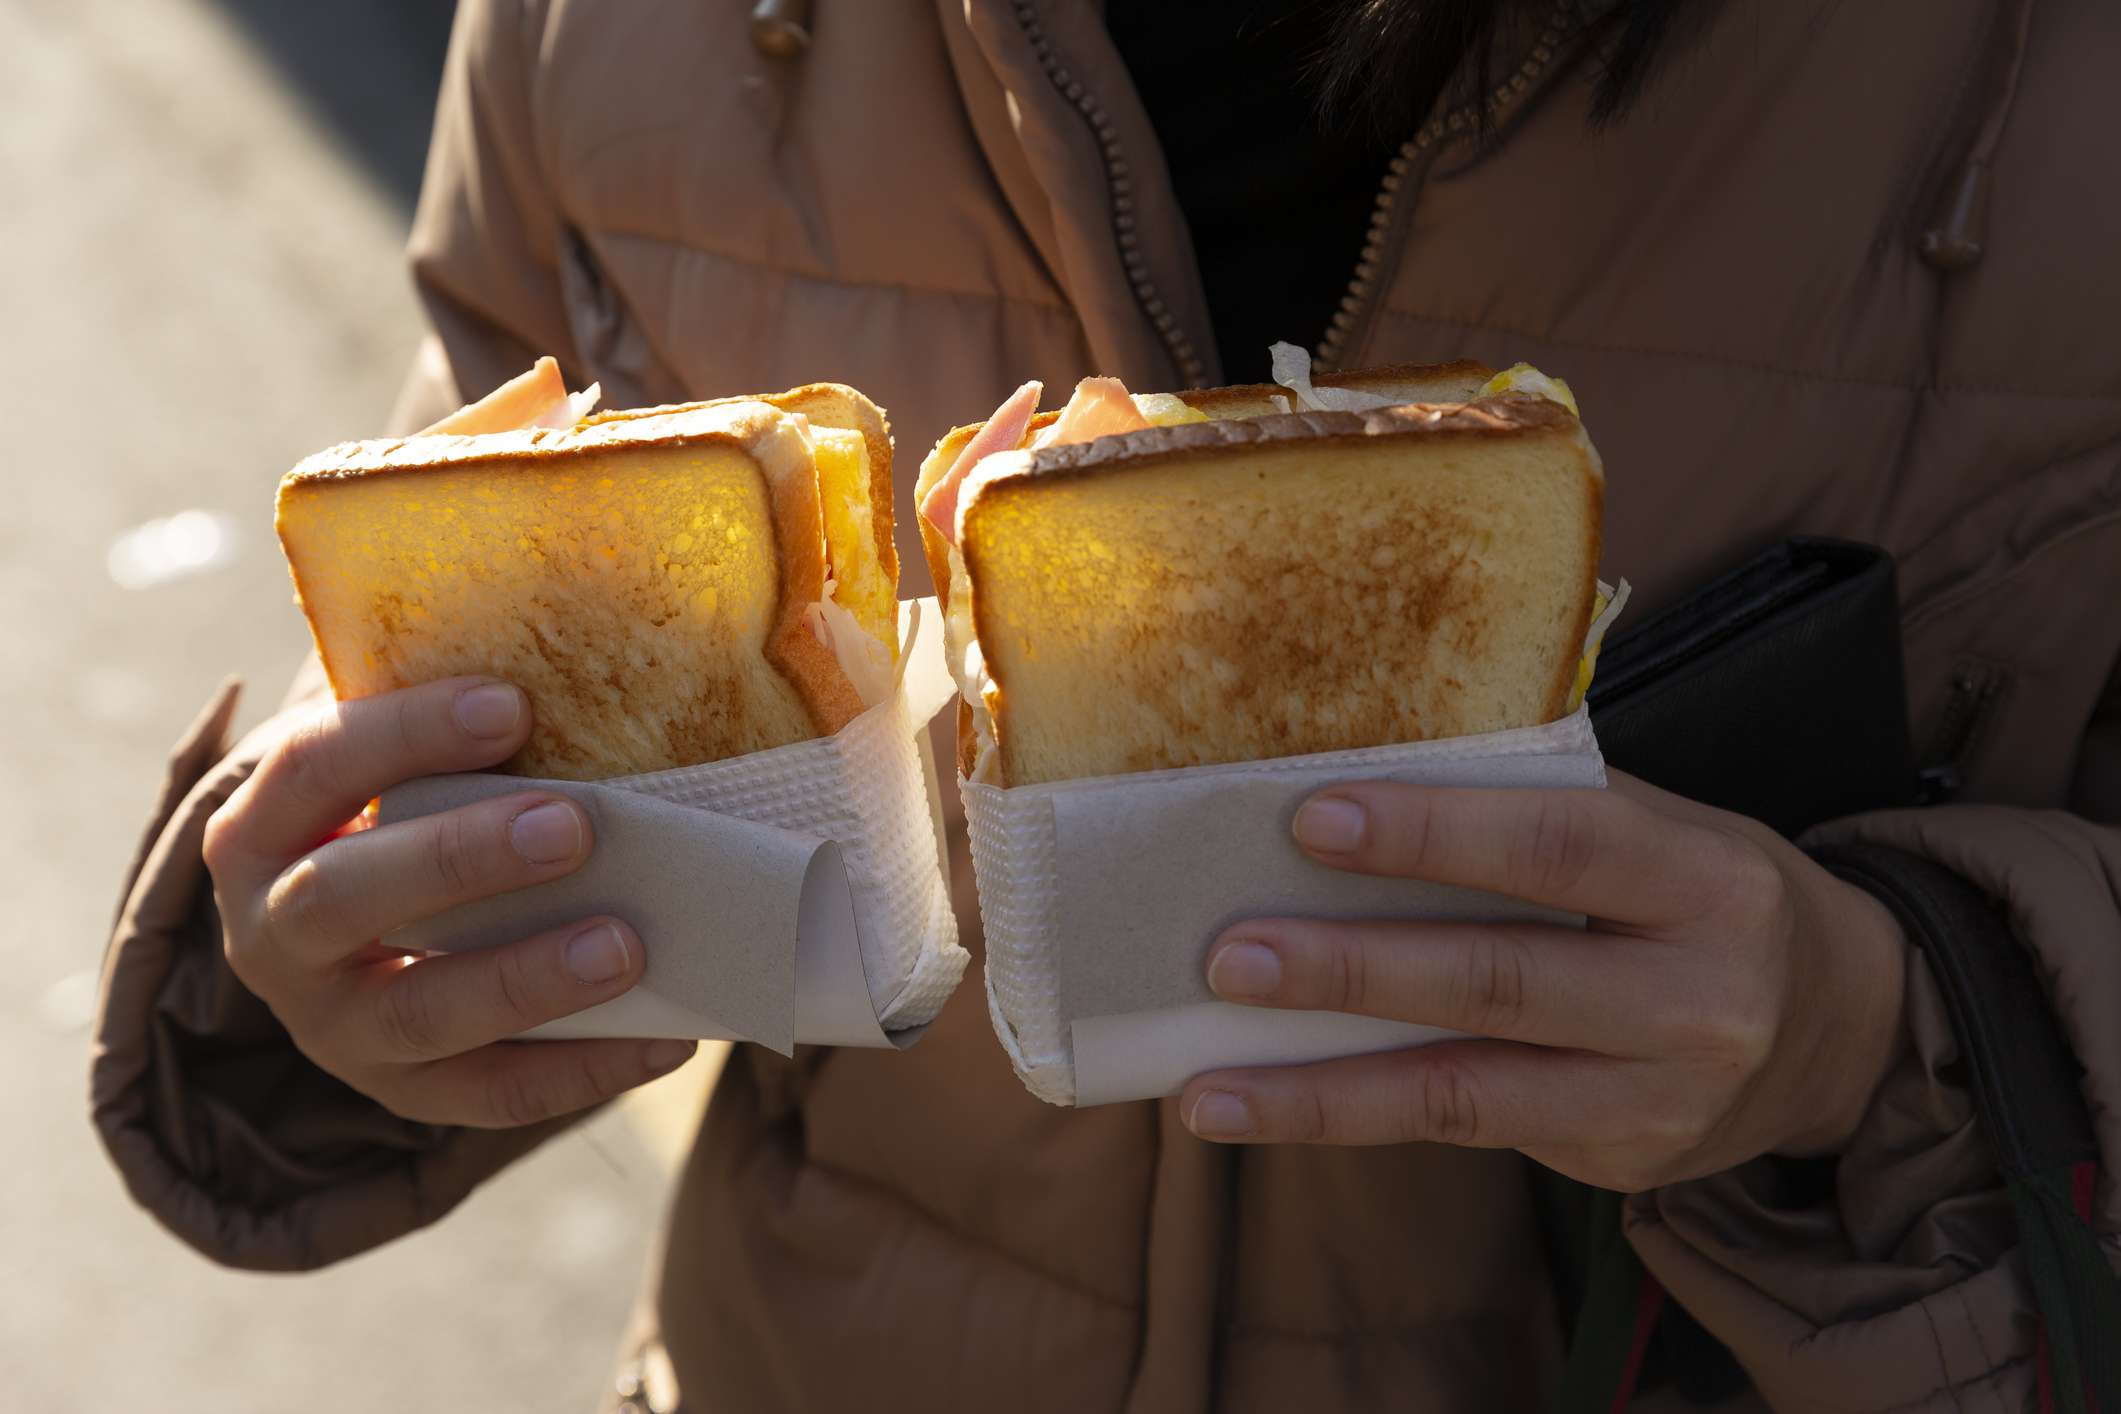 Hand holding South Korean style sandwiches,South Korea street food